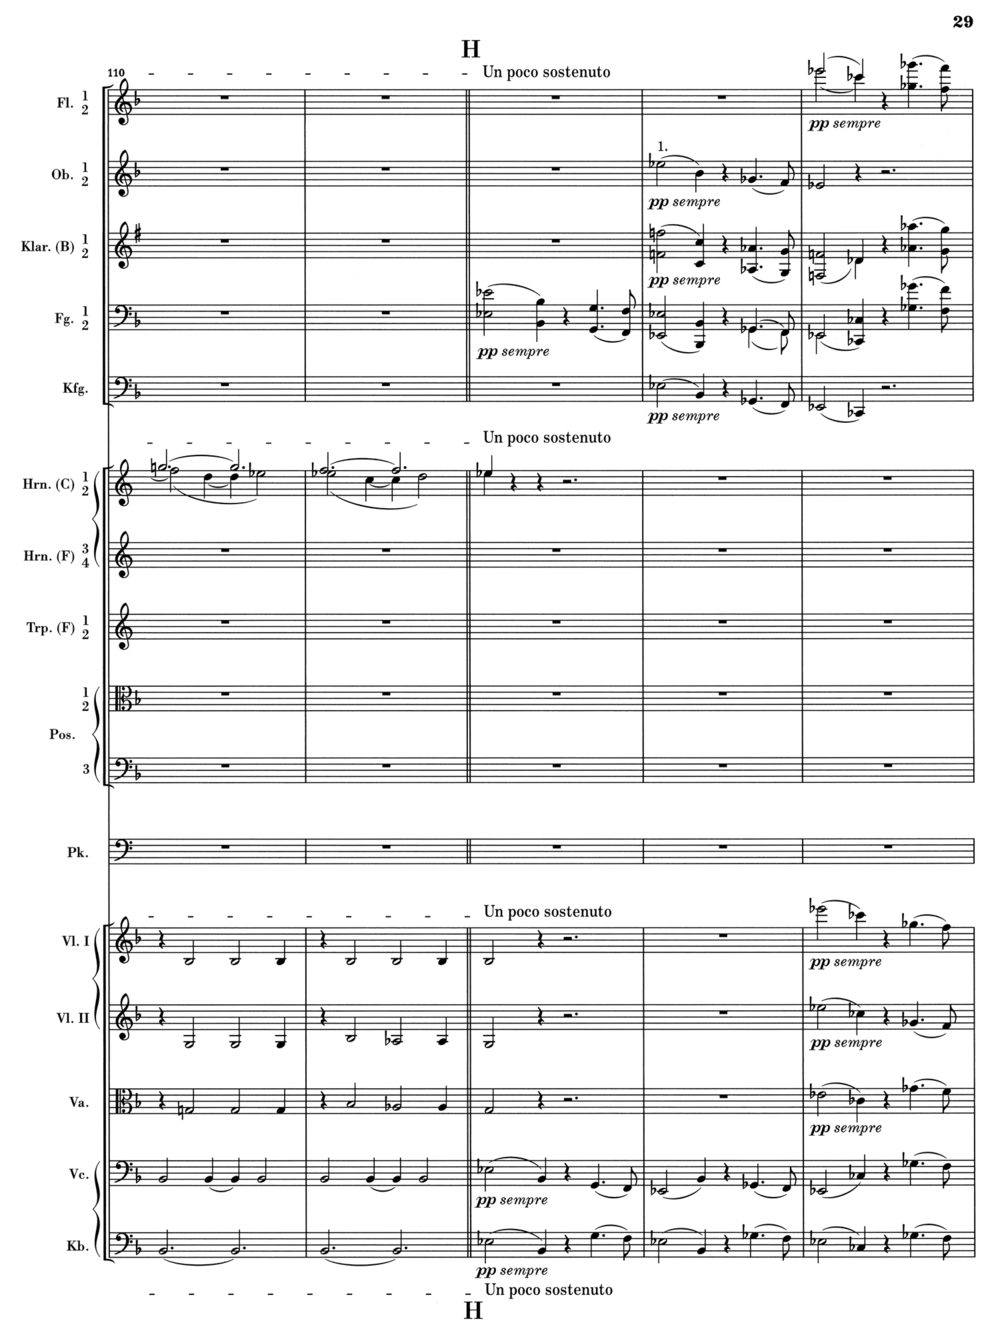 Brahms 3 Score 4.jpg